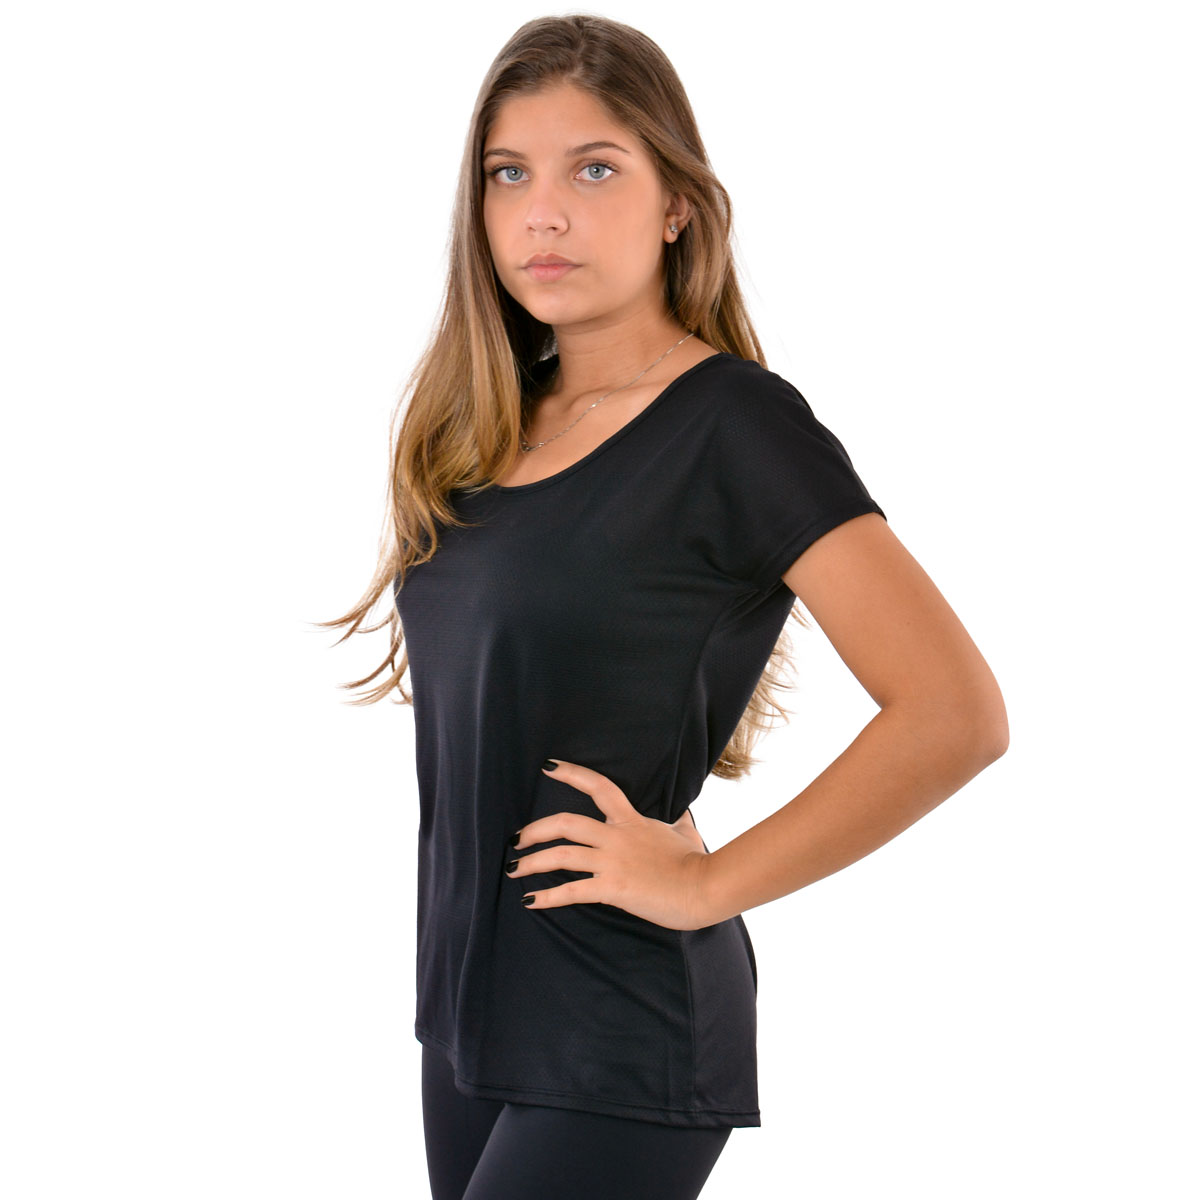 Camiseta feminina Dry Fit Selene